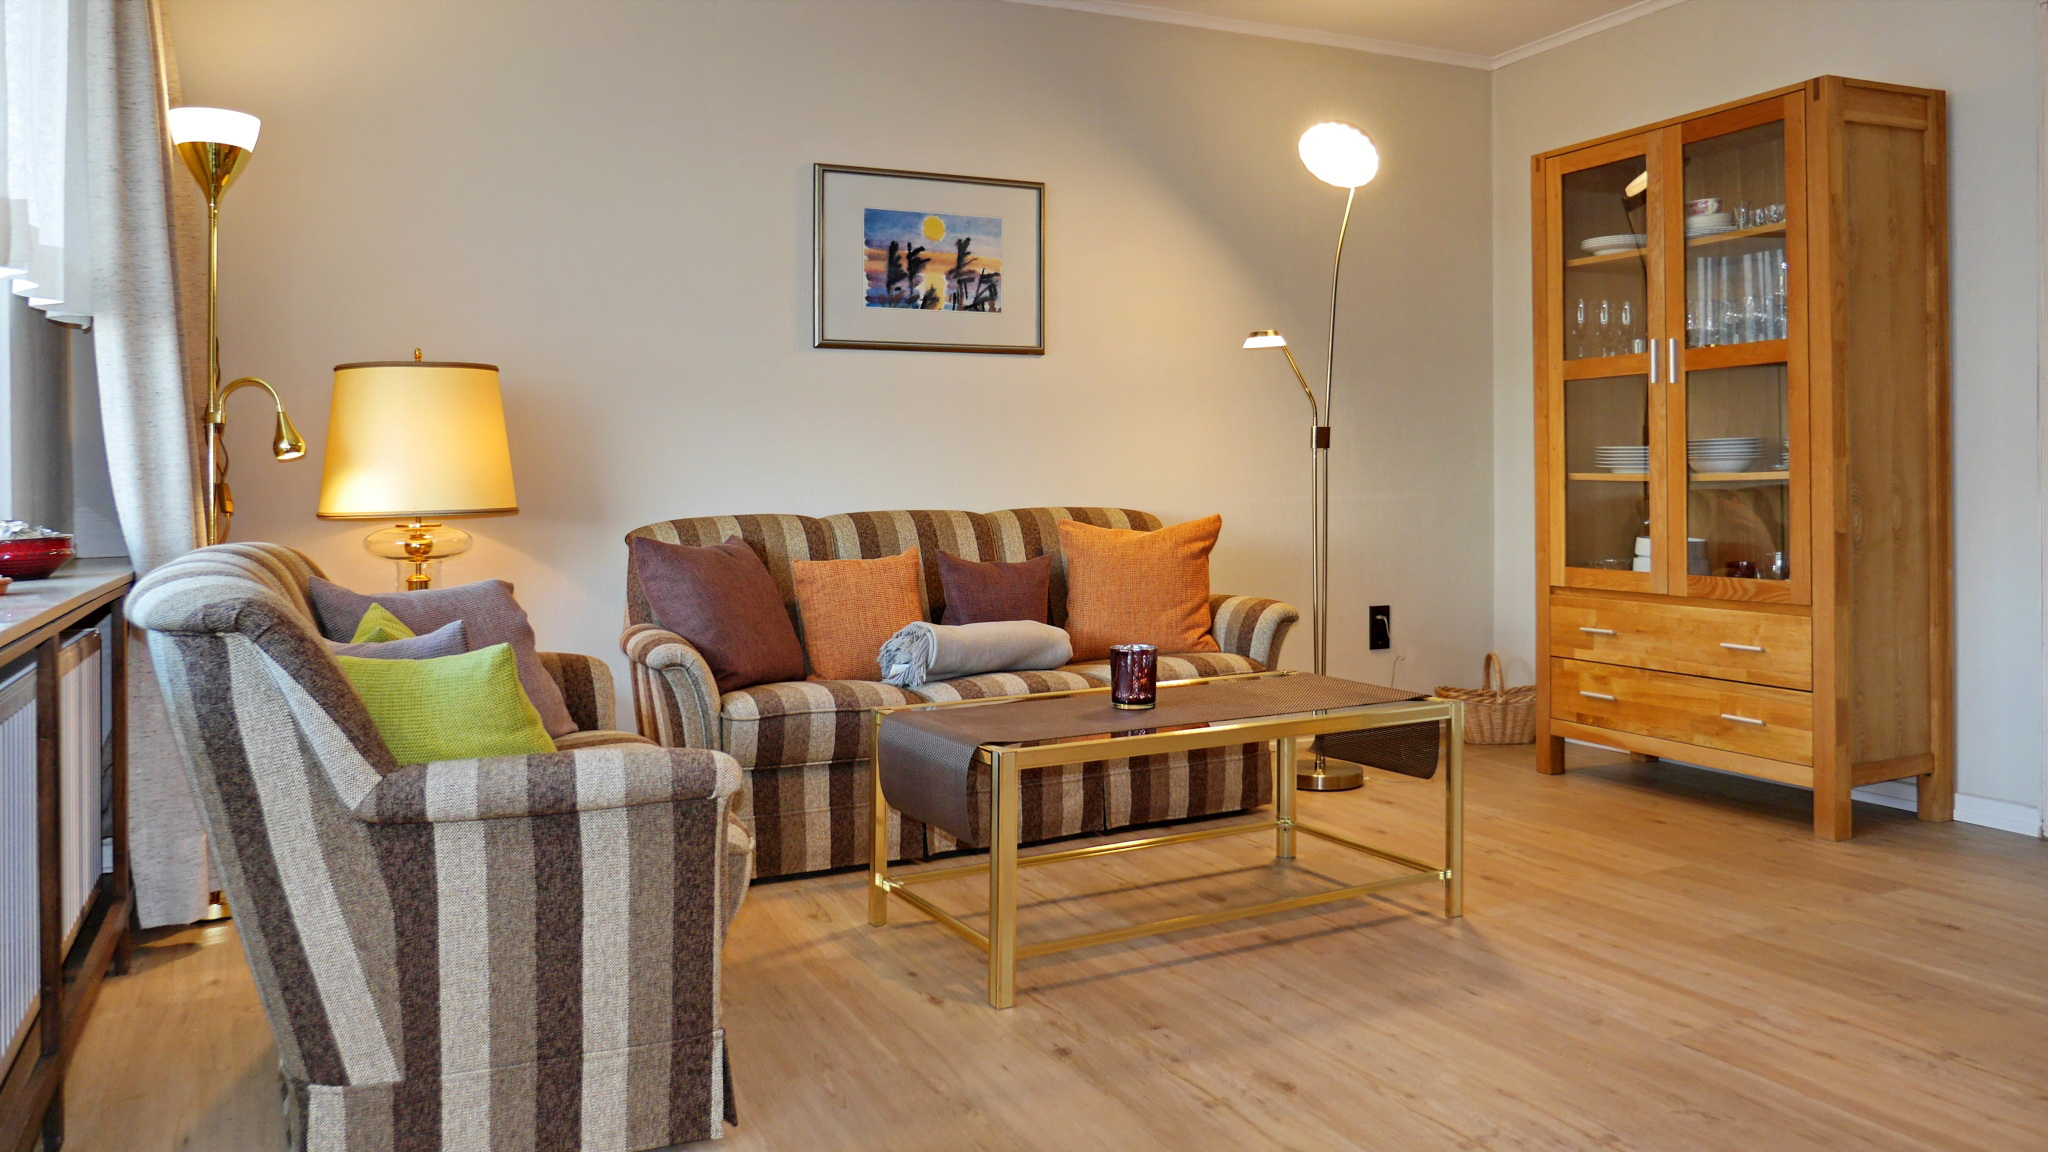 immobilien auf sylt wiking sylt immobilien. Black Bedroom Furniture Sets. Home Design Ideas